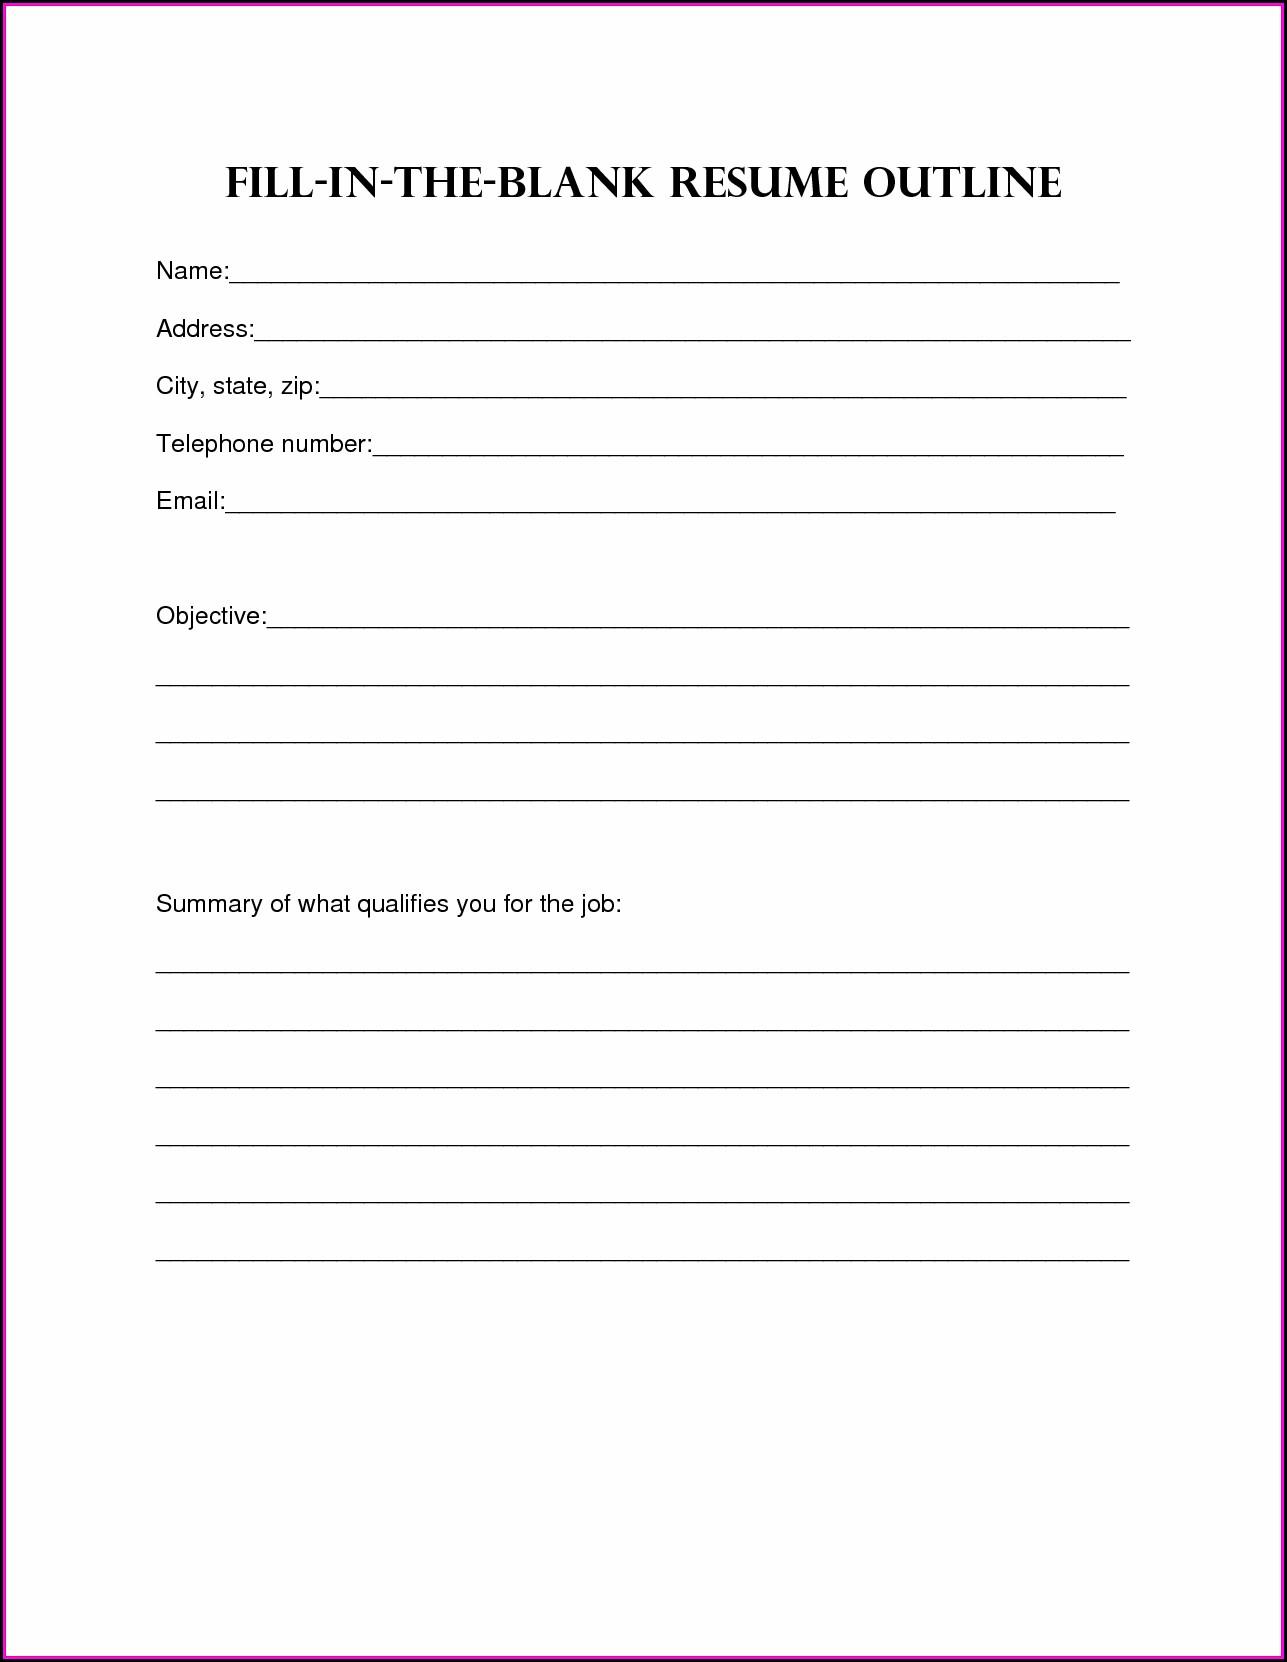 Fill In The Blanks Resume